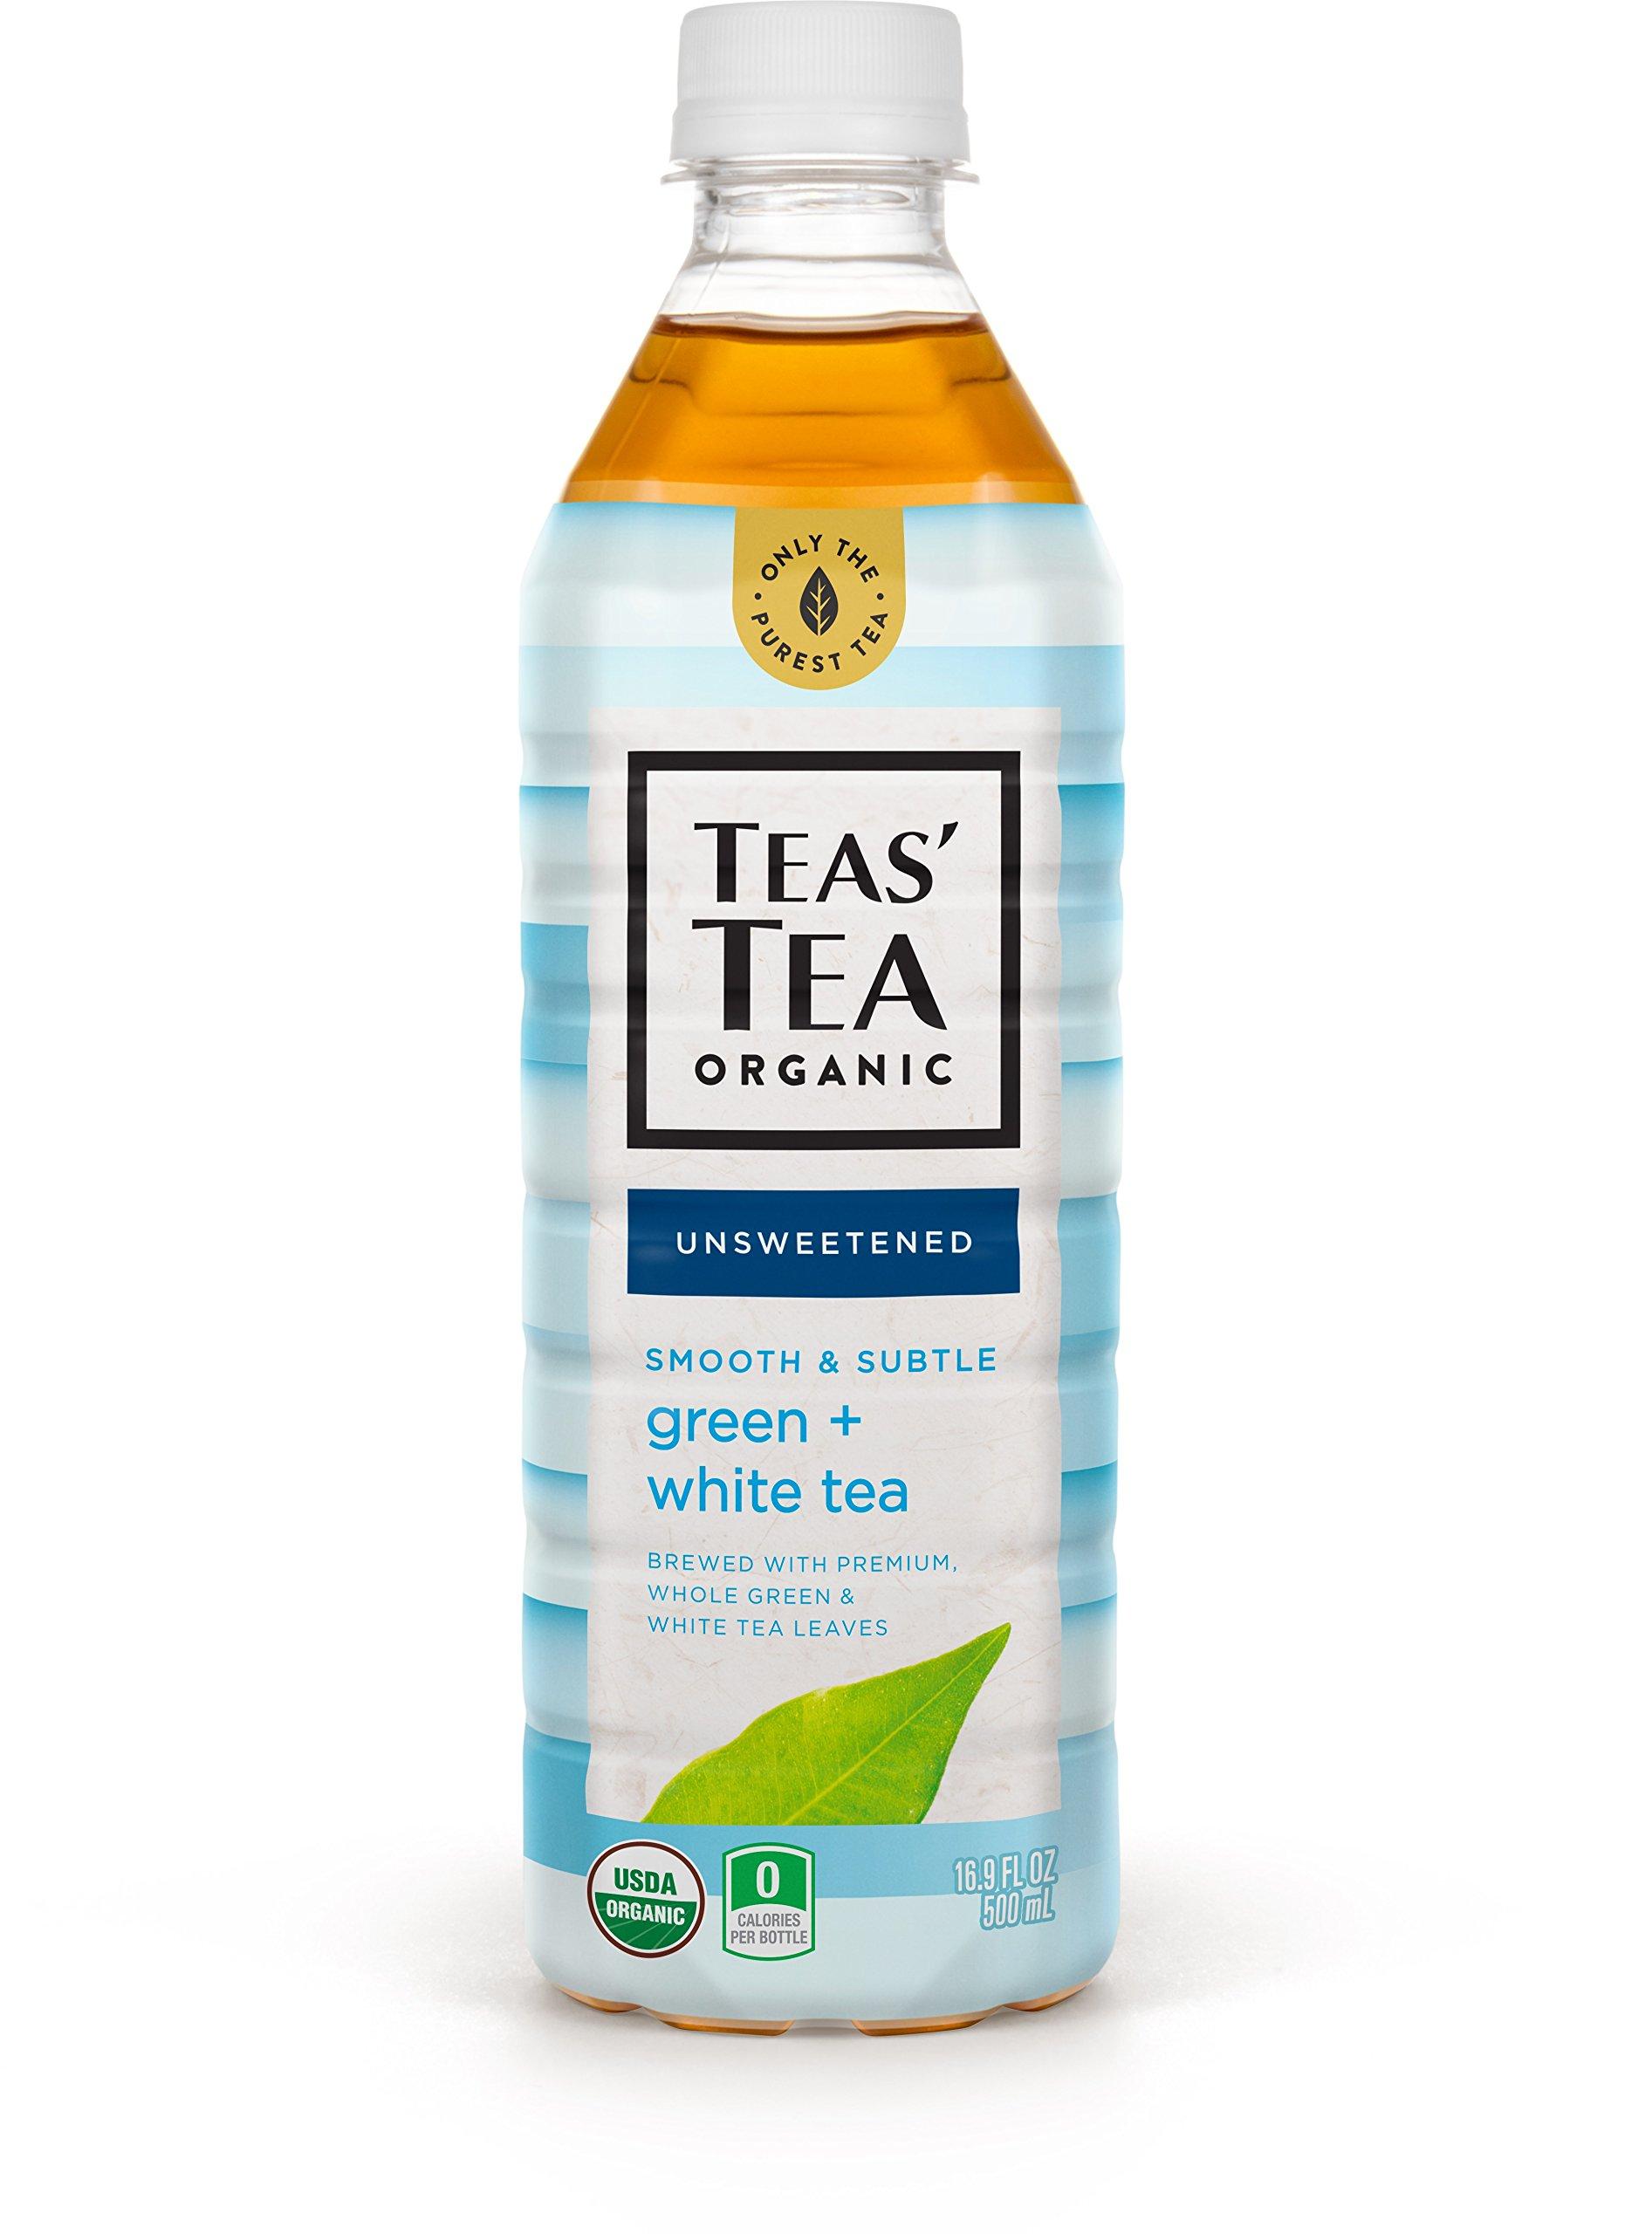 Teas' Tea Unsweetened Green White Tea 16.9 Ounce (Pack of 12) Organic Zero Calories No Sugars No Artificial Sweeteners Antioxidant Rich High in Vitamin C